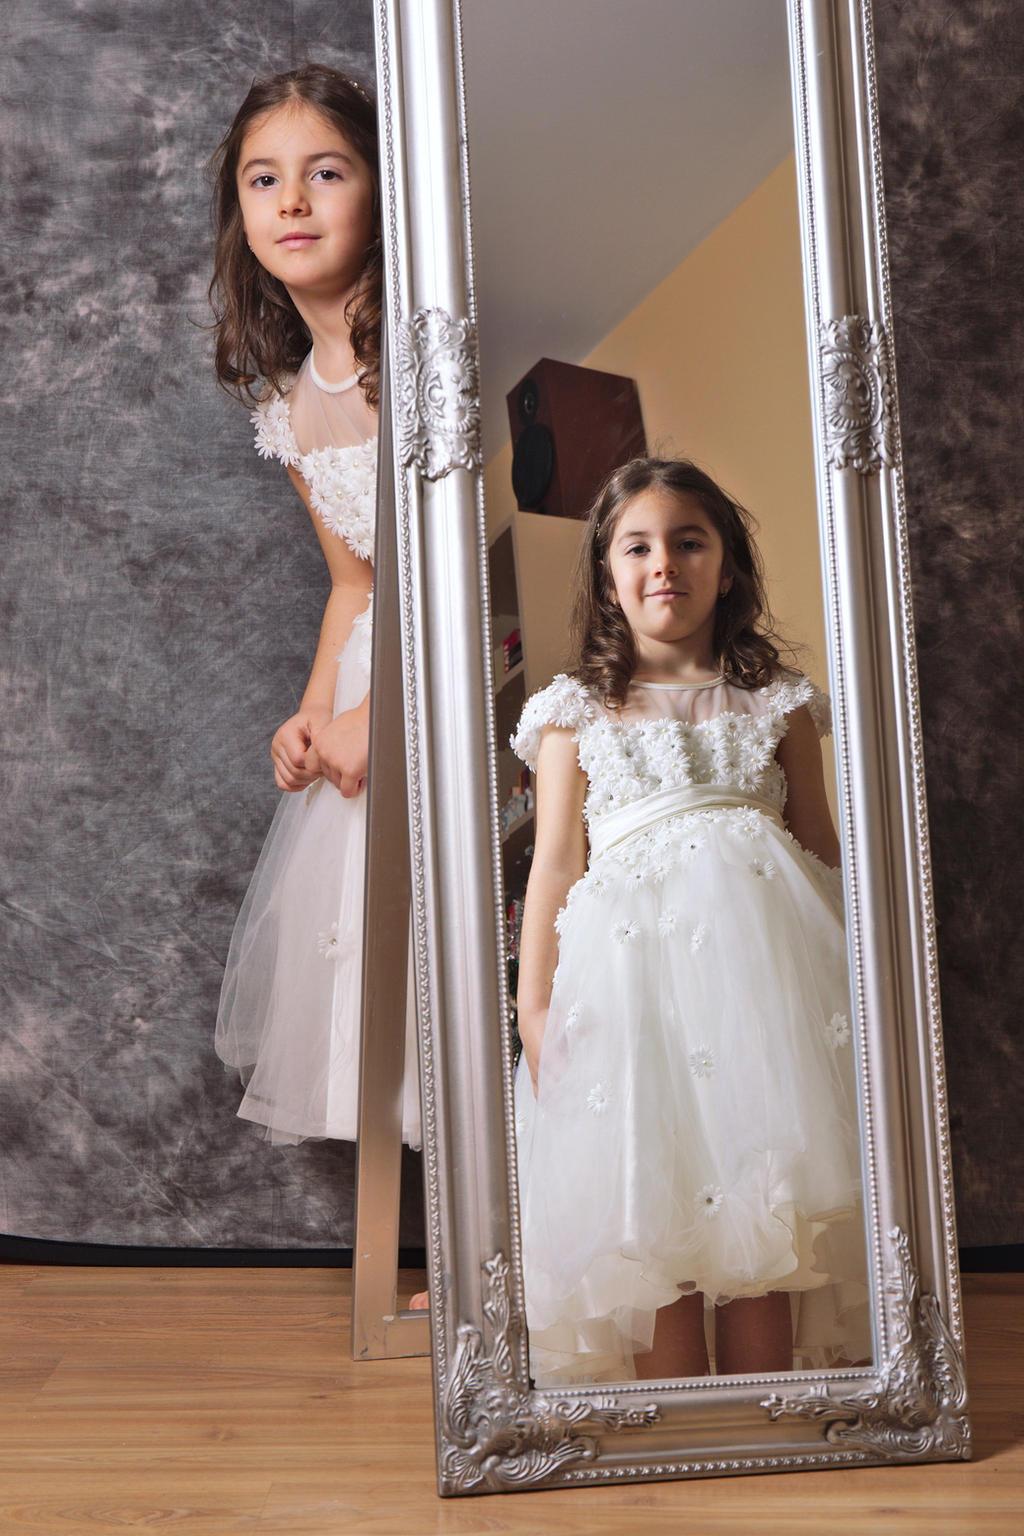 In the mirror by nicubunu